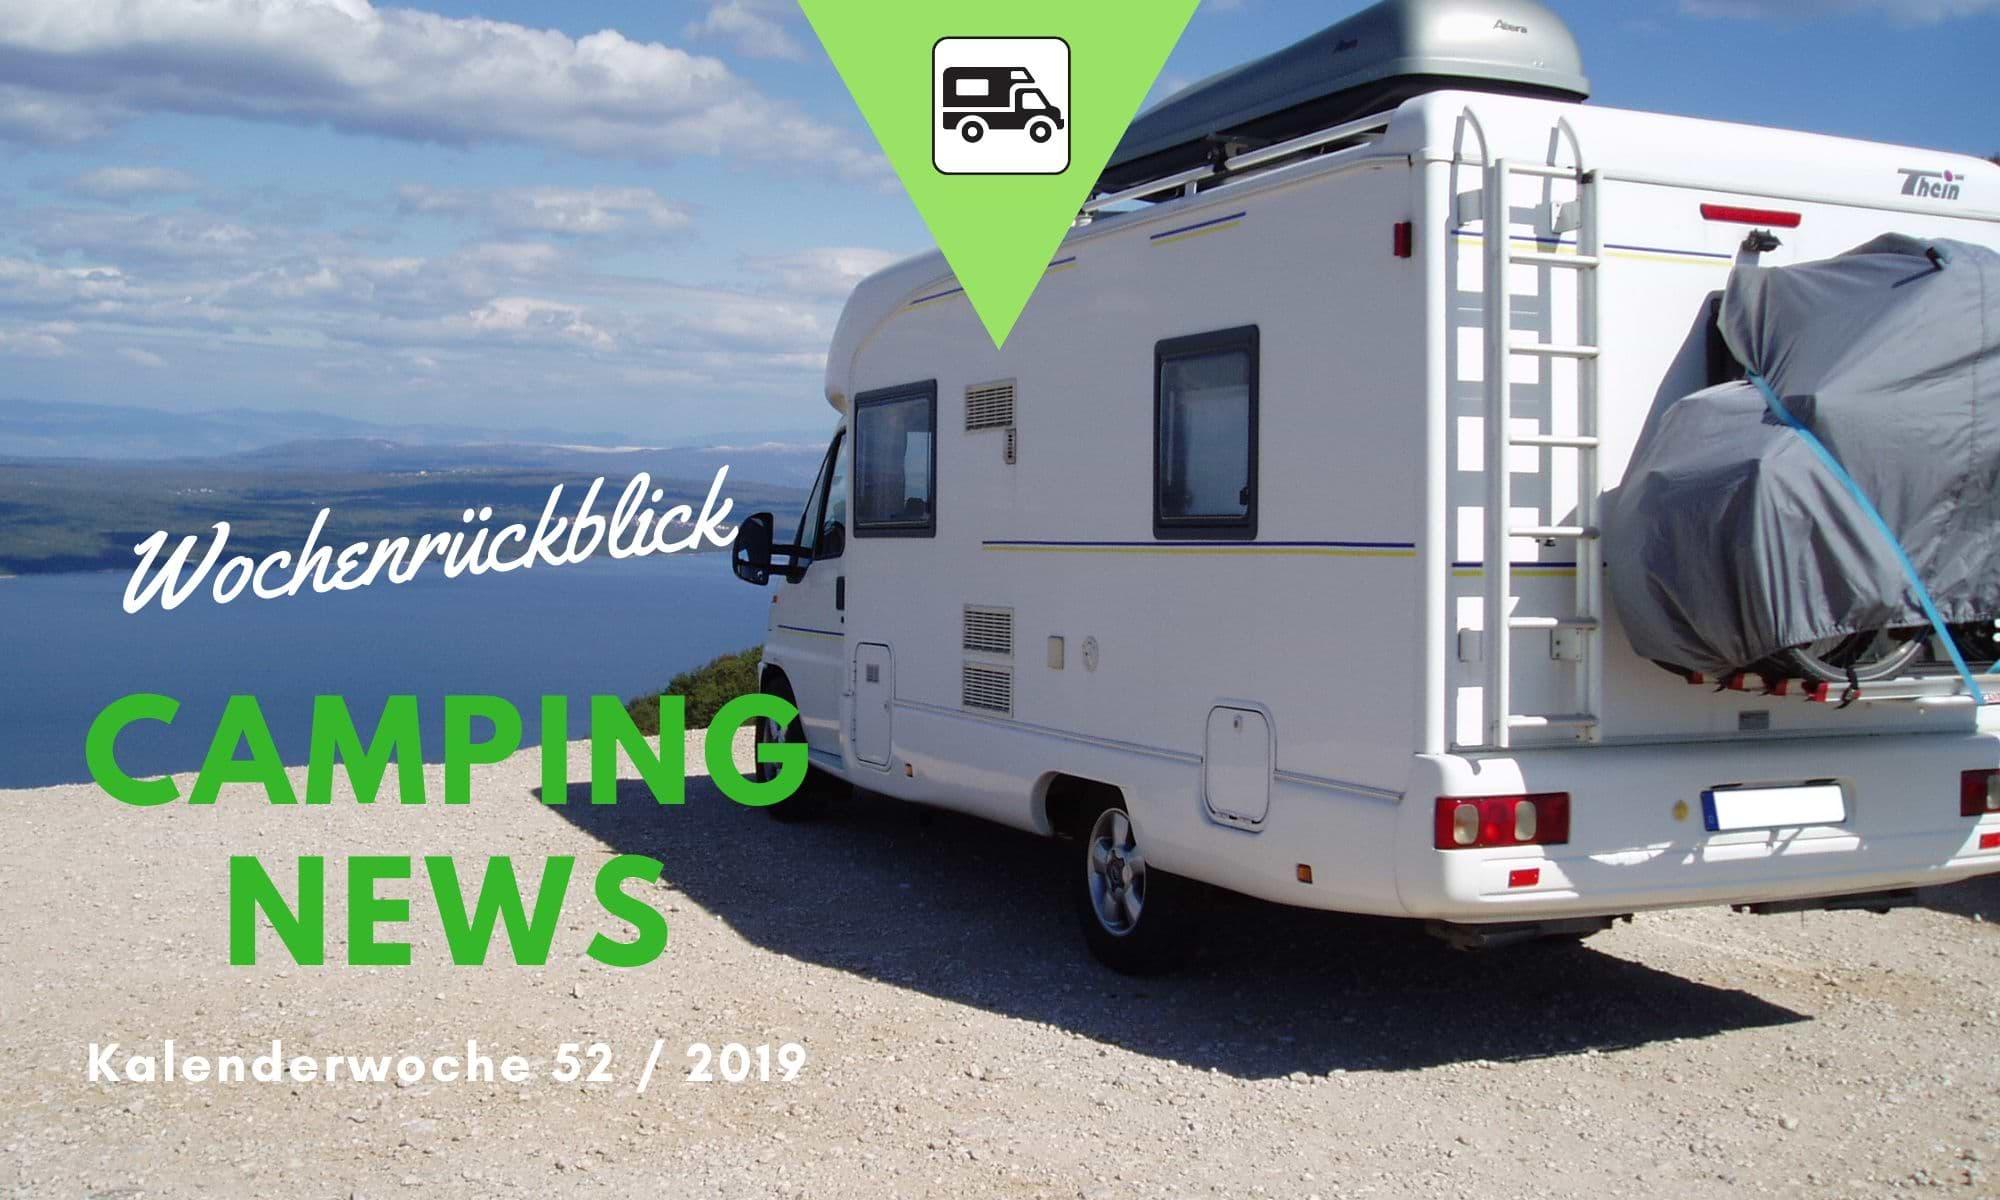 Wochenrückblick Camping News KW52-2019